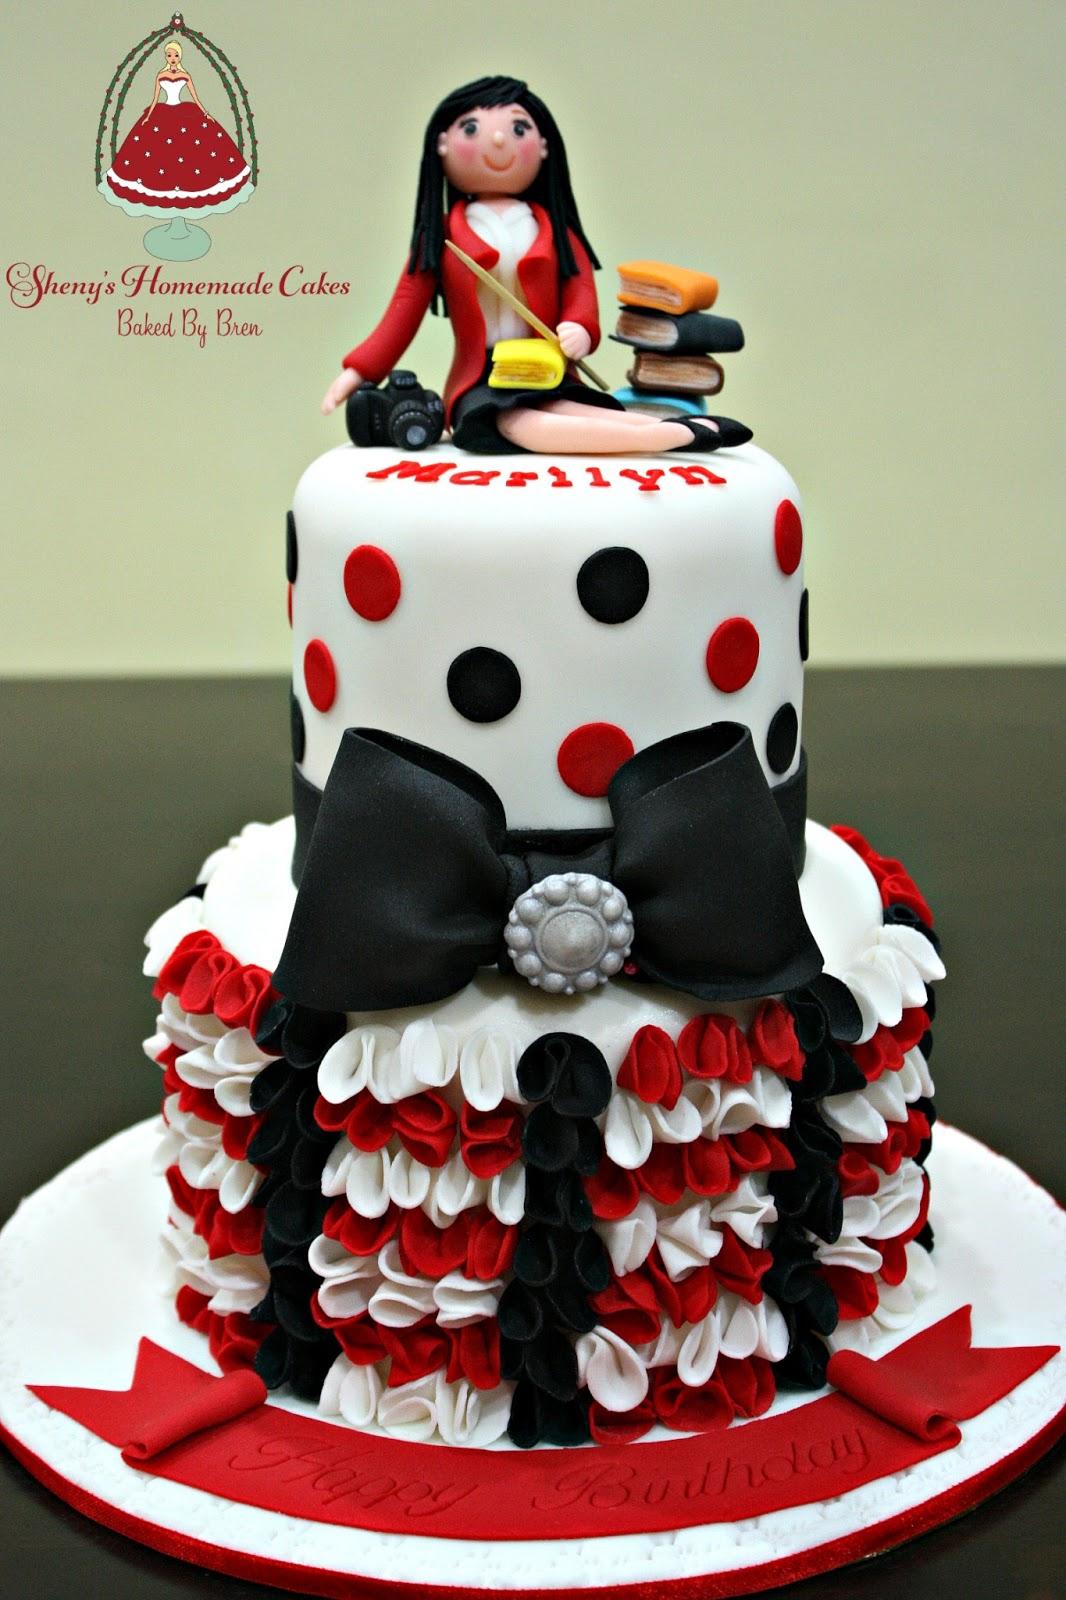 Sheny s Homemade Treats Red Black and White Birthday Cake